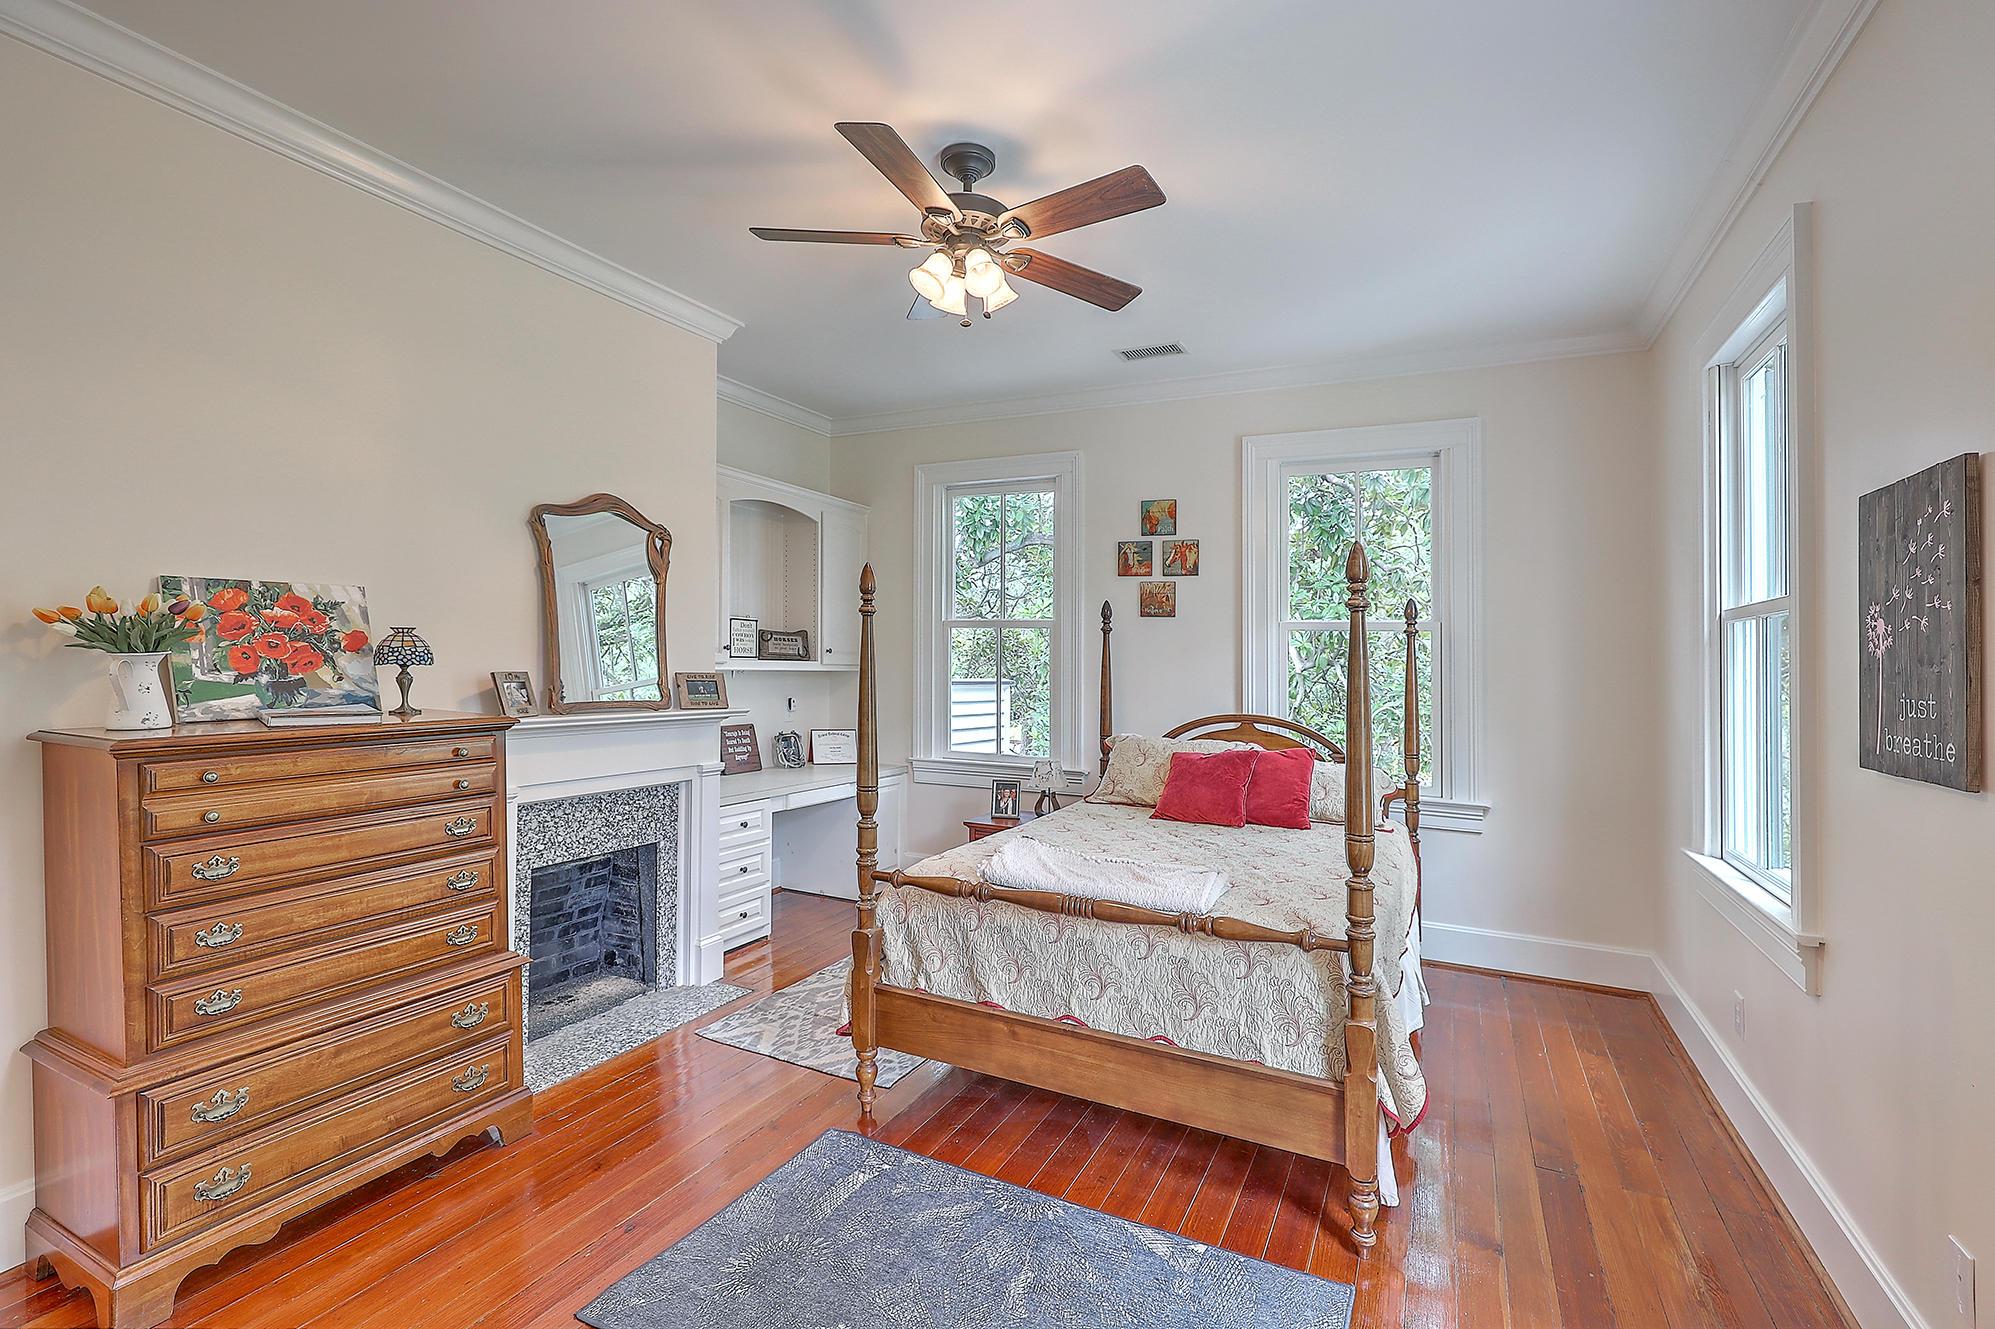 Summerville Homes For Sale - 102 Hickory, Summerville, SC - 95